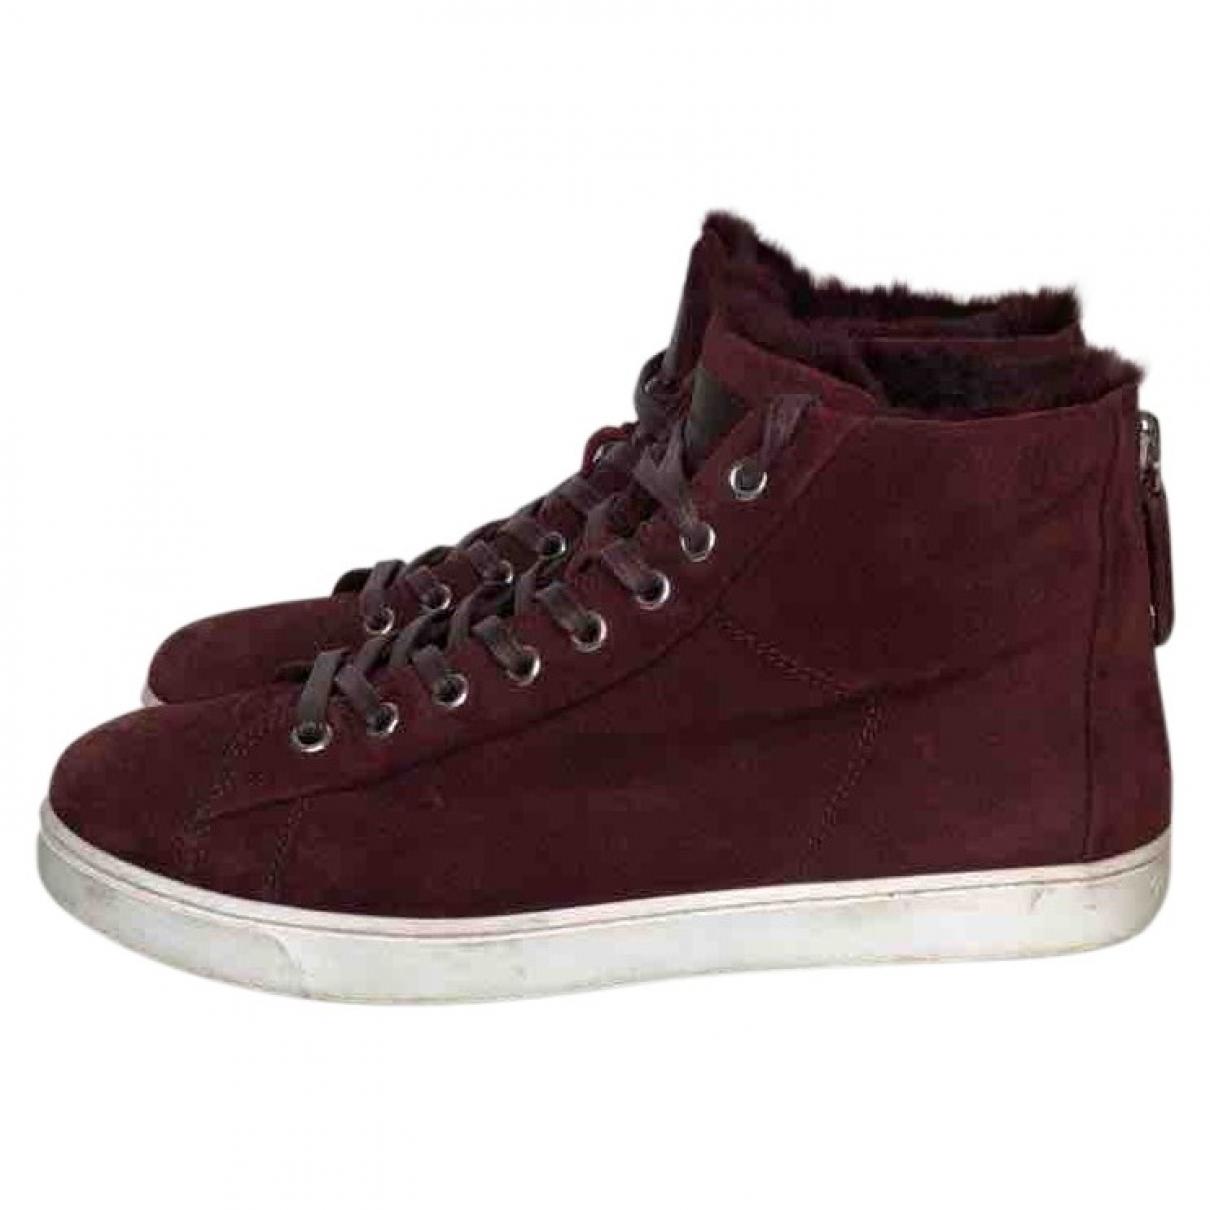 Gianvito Rossi \N Sneakers in  Bordeauxrot Veloursleder